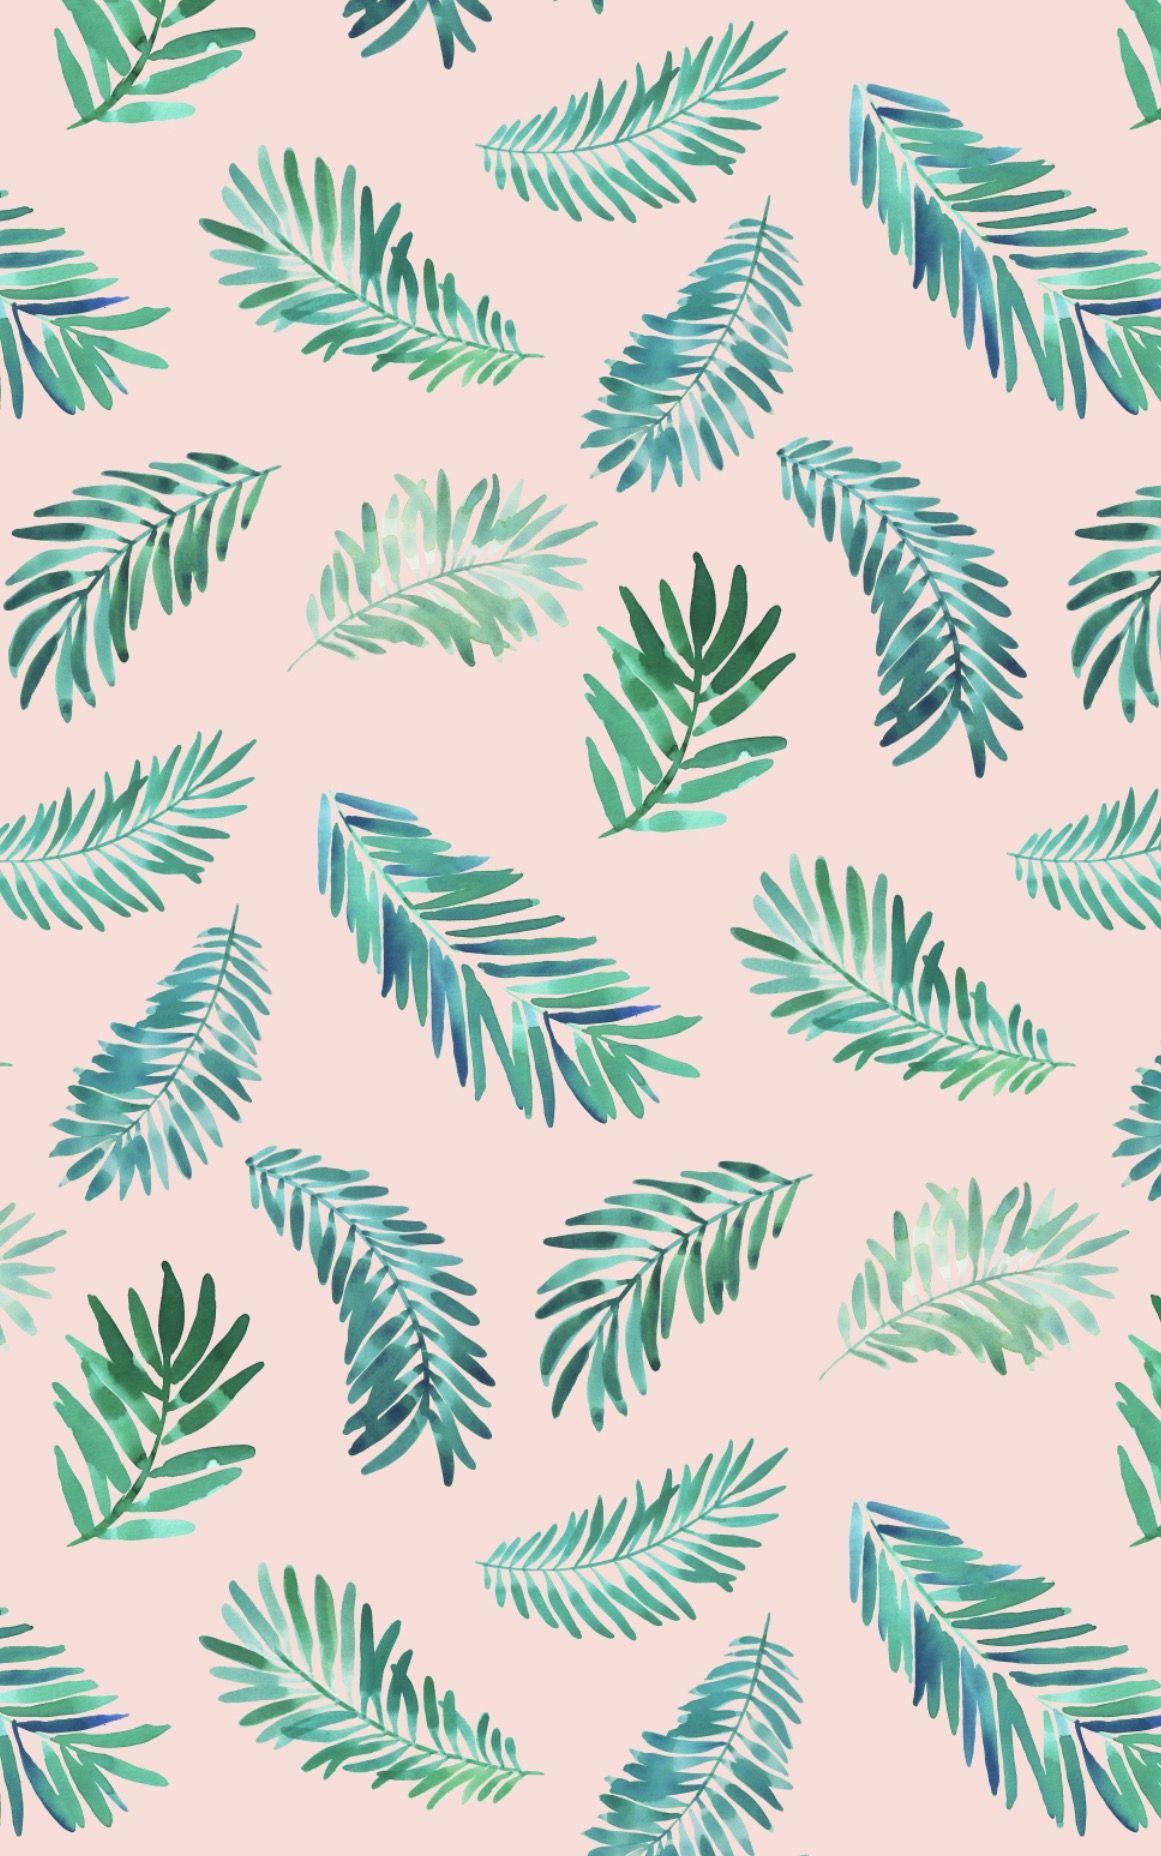 Iphone wallpaper tumblr pattern